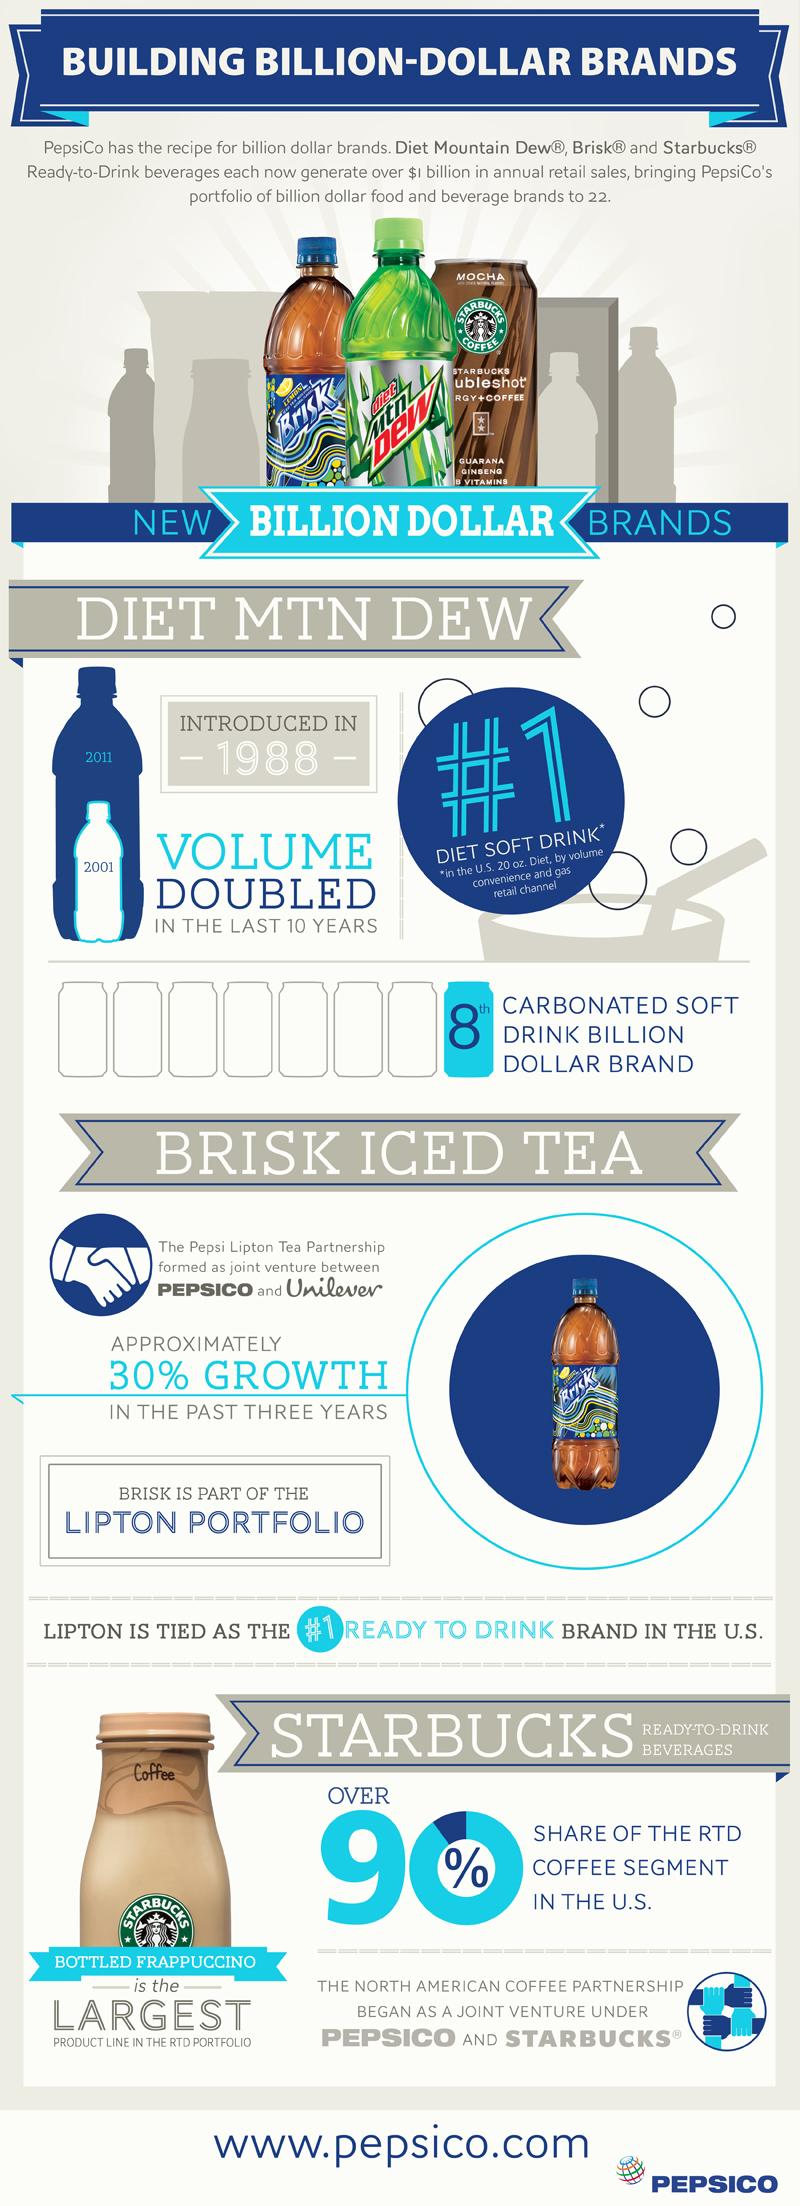 Building Billion-Dollar Brands